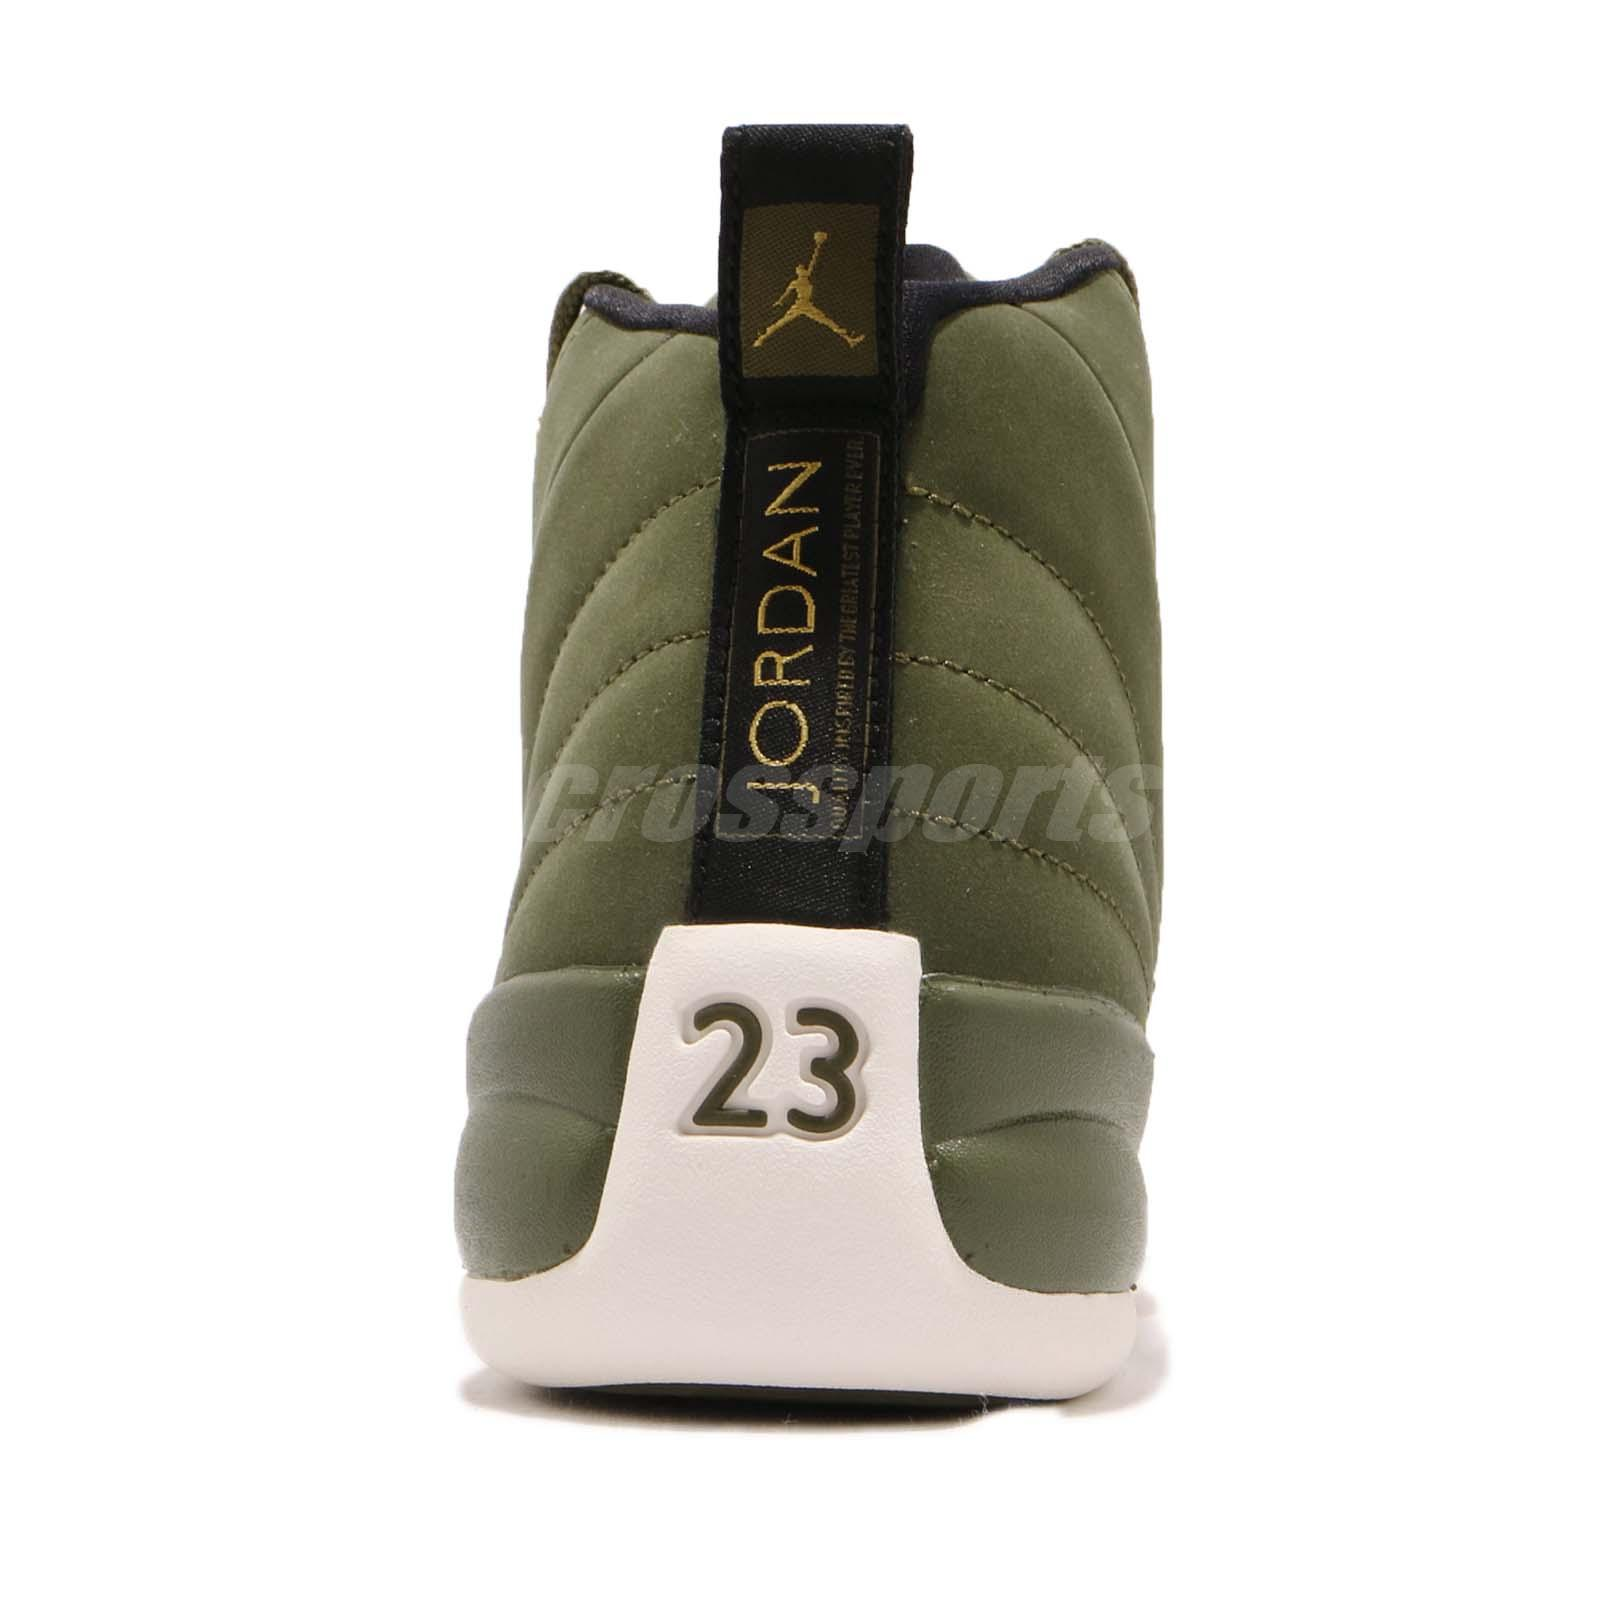 864a376ae0e Nike Air Jordan 12 Retro GS Chris Paul Class Of 2003 Olive Kids ...